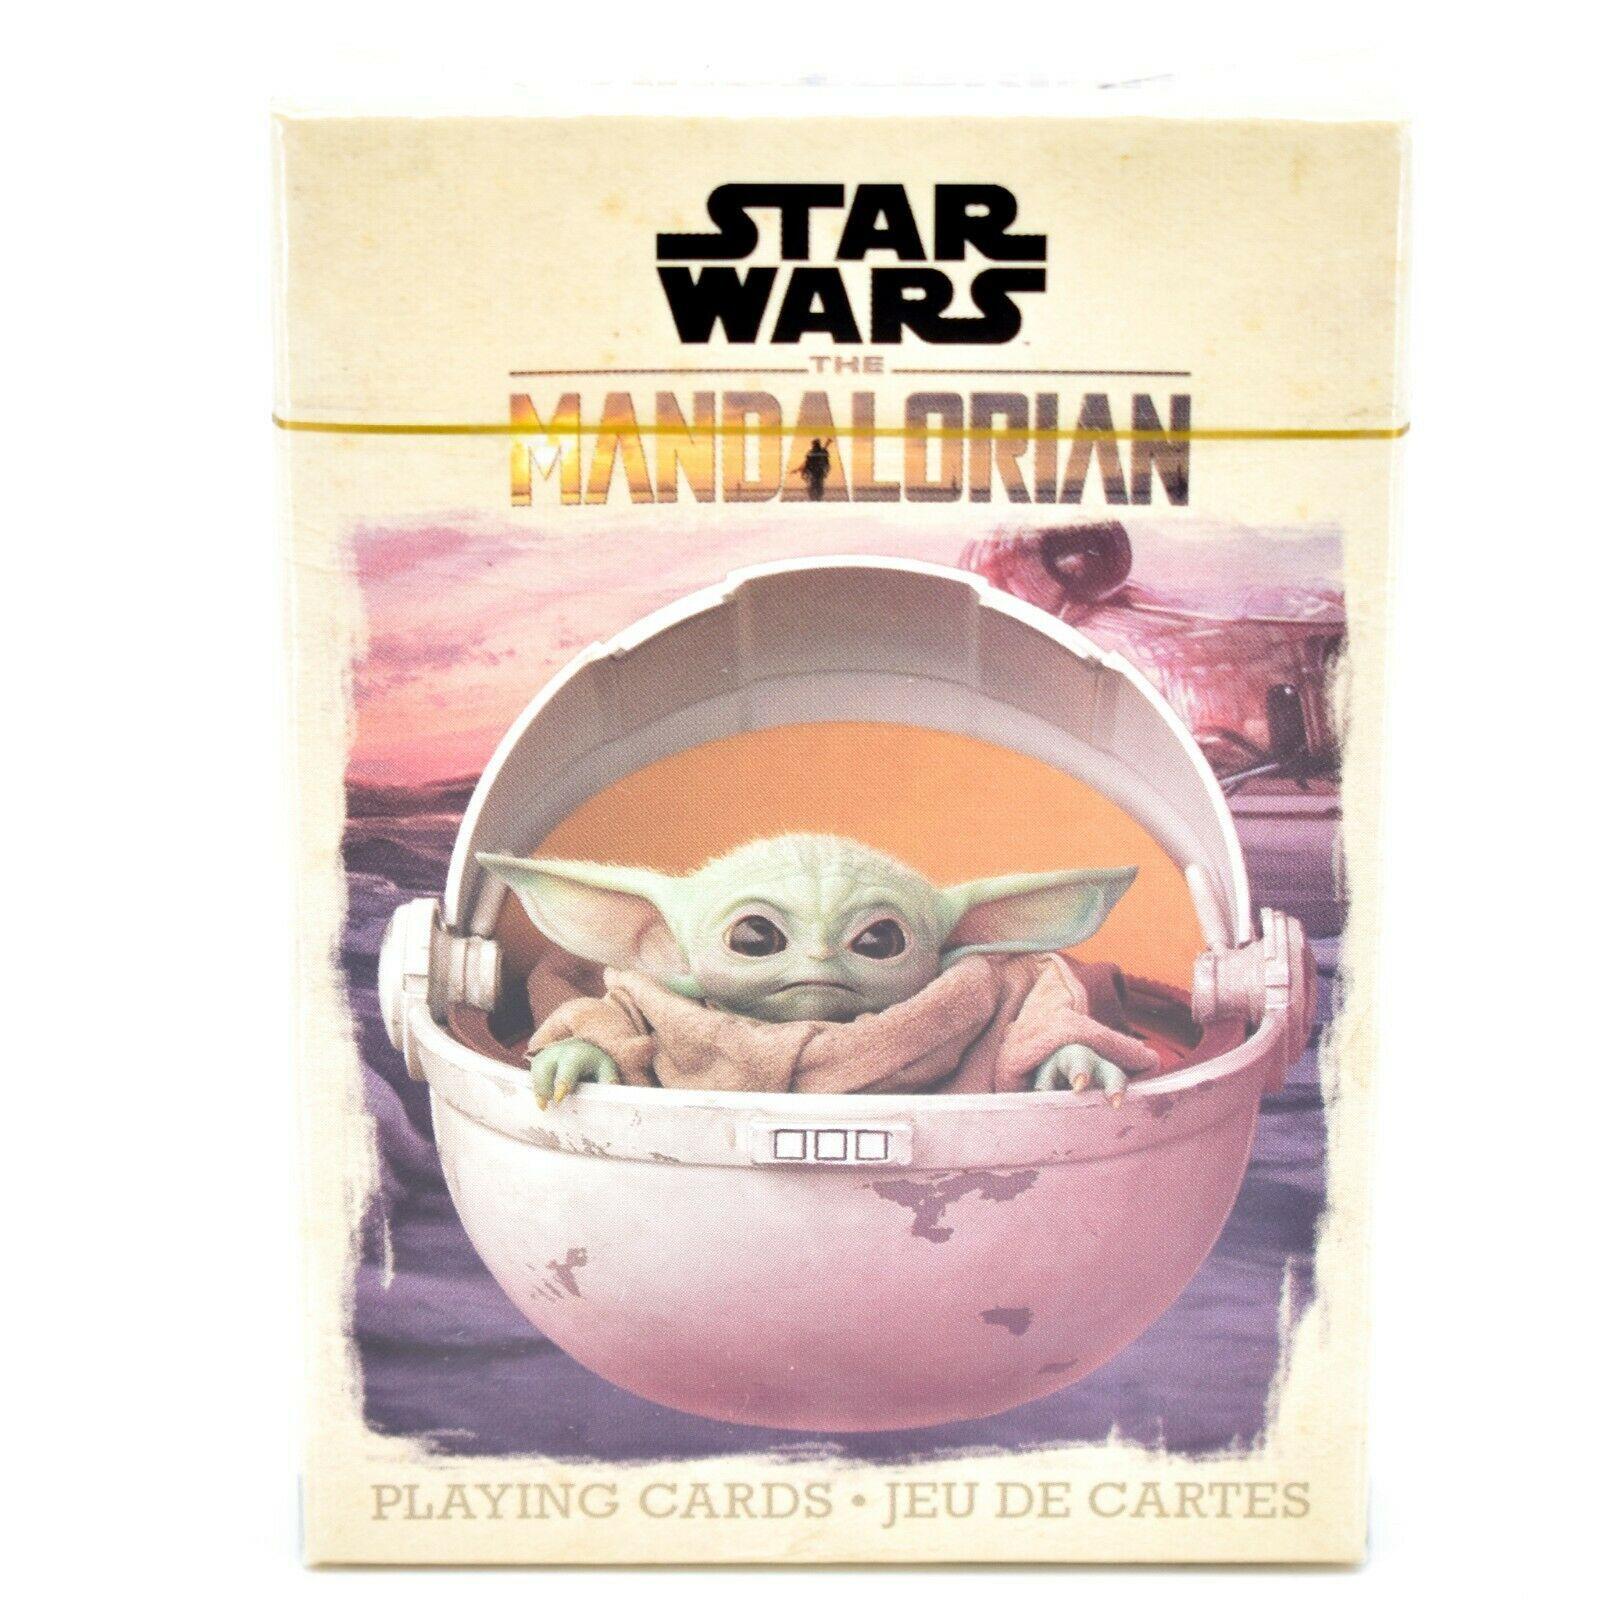 Aquarius Star Wars The Mandalorian The Child Baby Yoda Theme Playing Cards